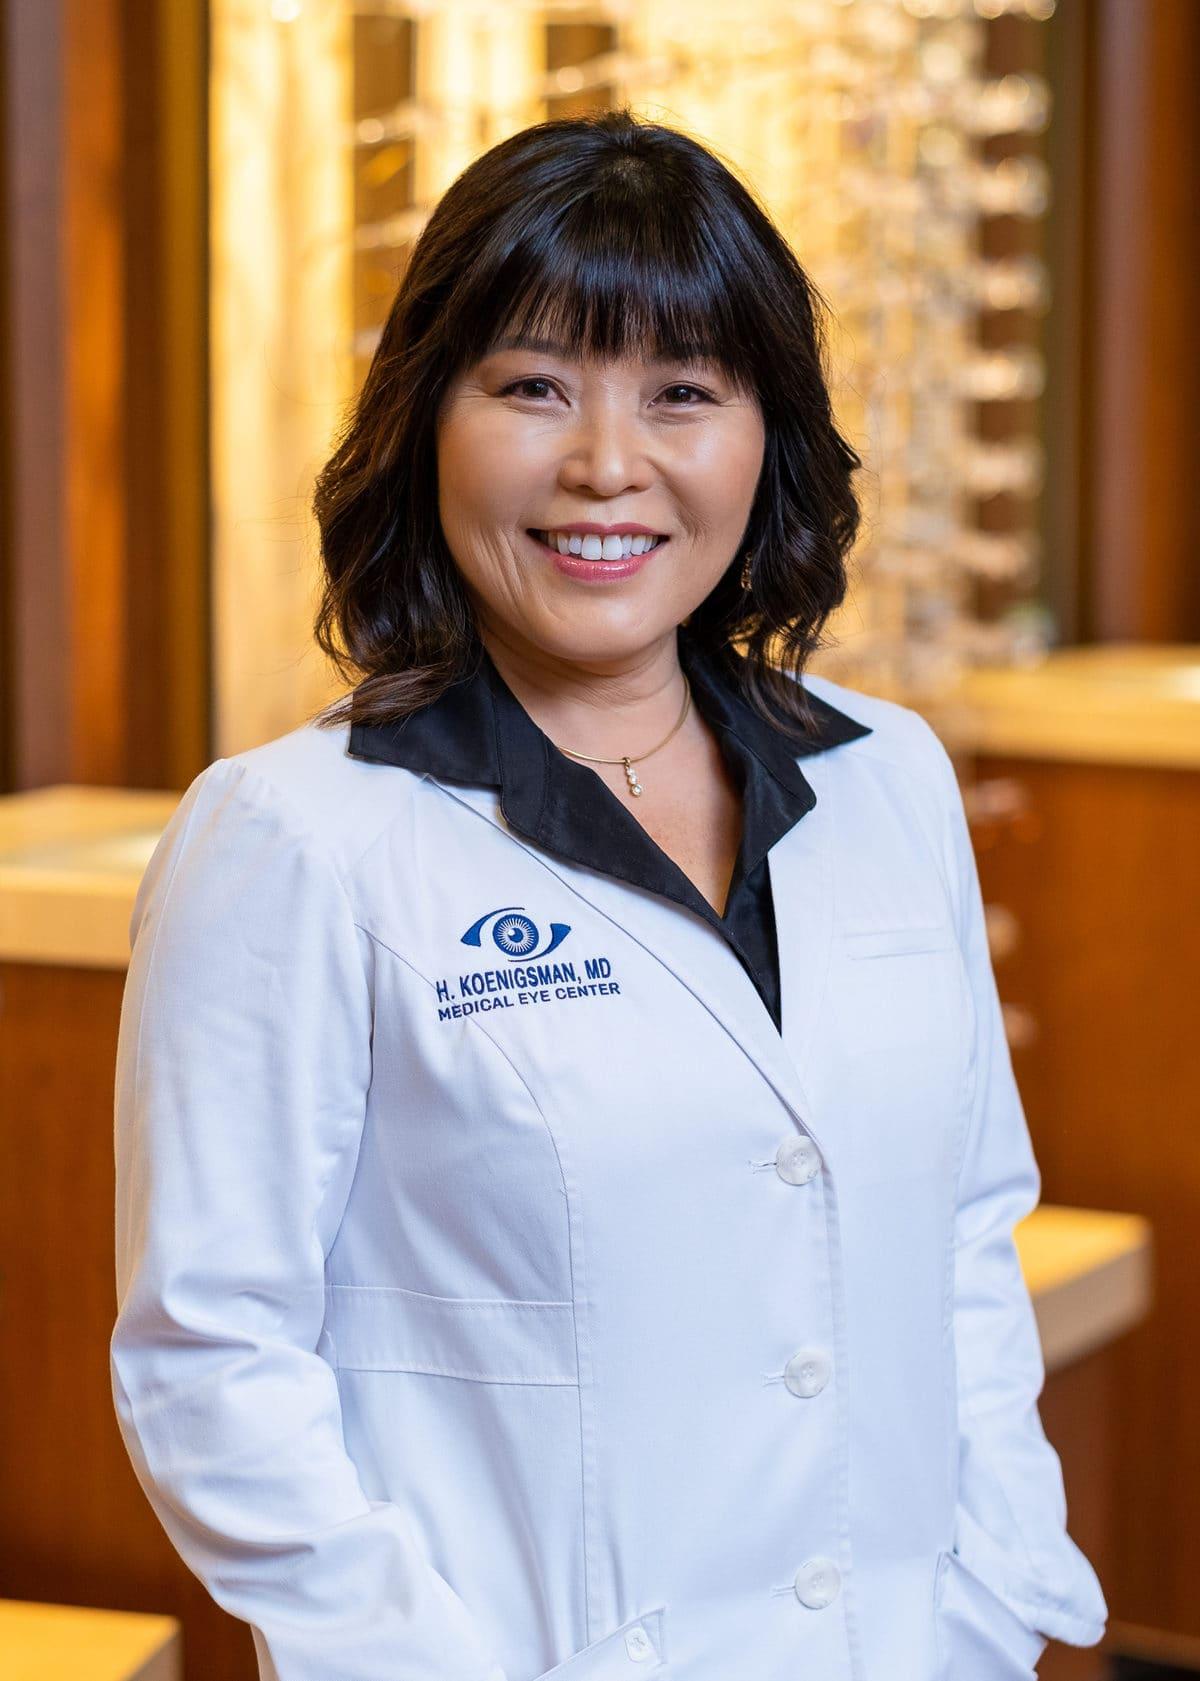 Helen Koenigsman, MD